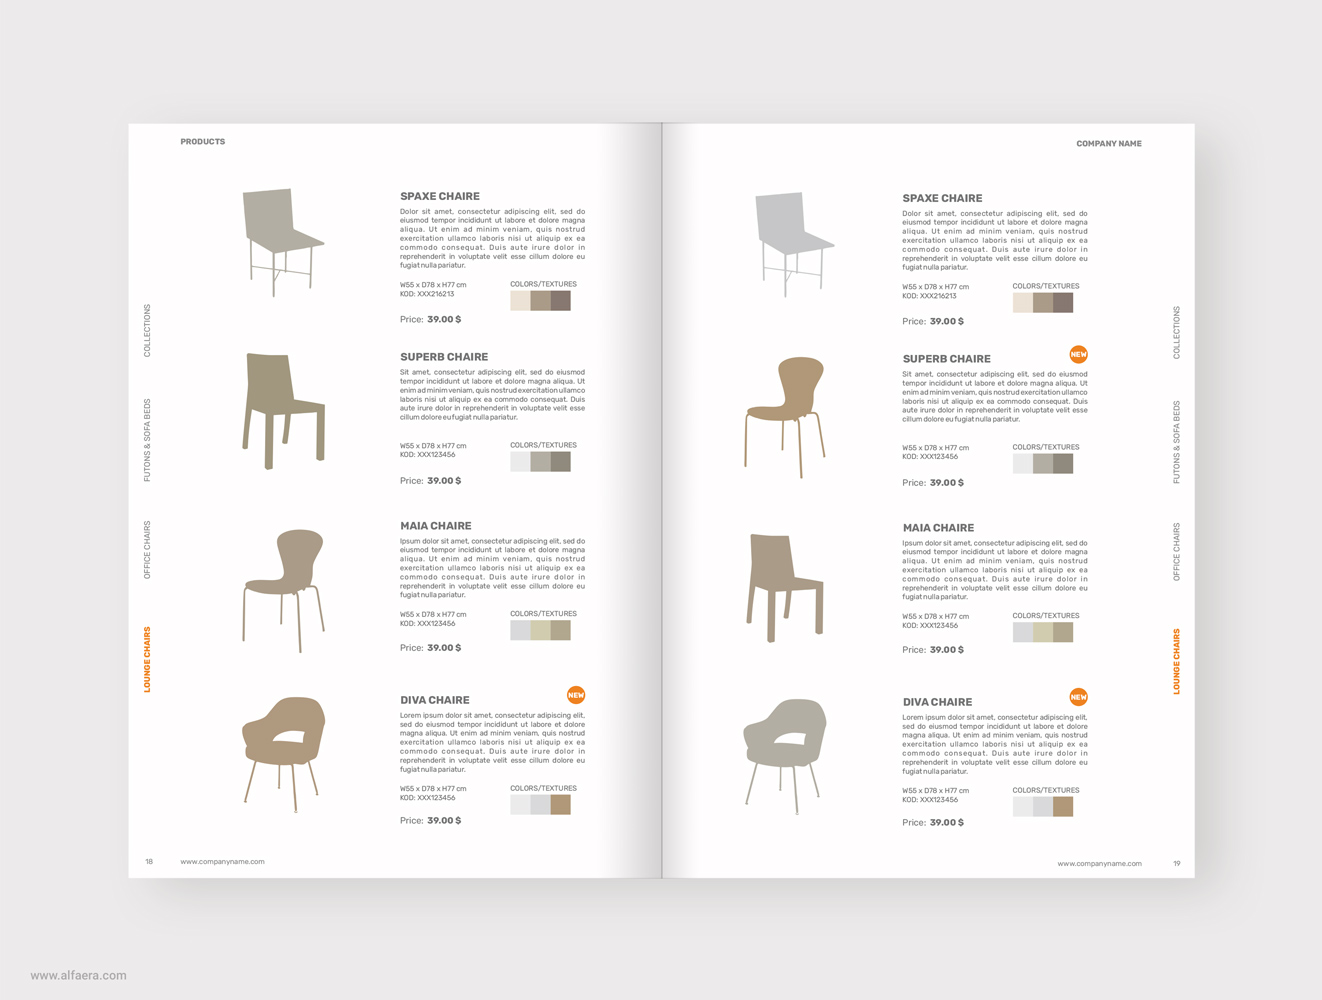 Product Catalog Brochure Template Coreldraw Alfaera